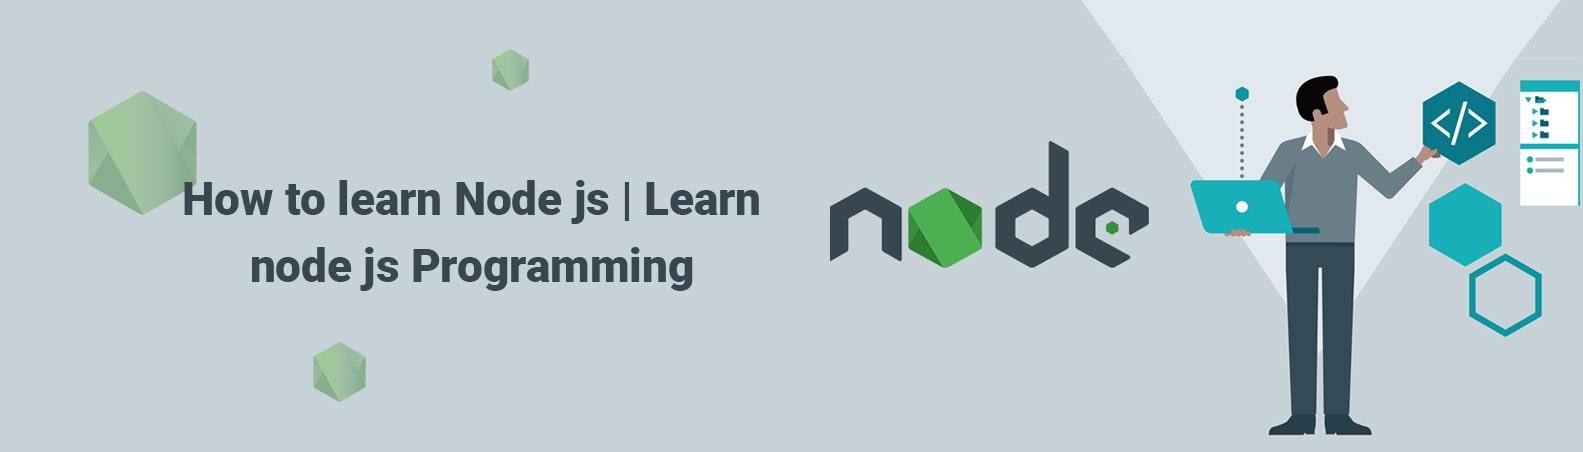 How to learn Node js | Learn node js Programming